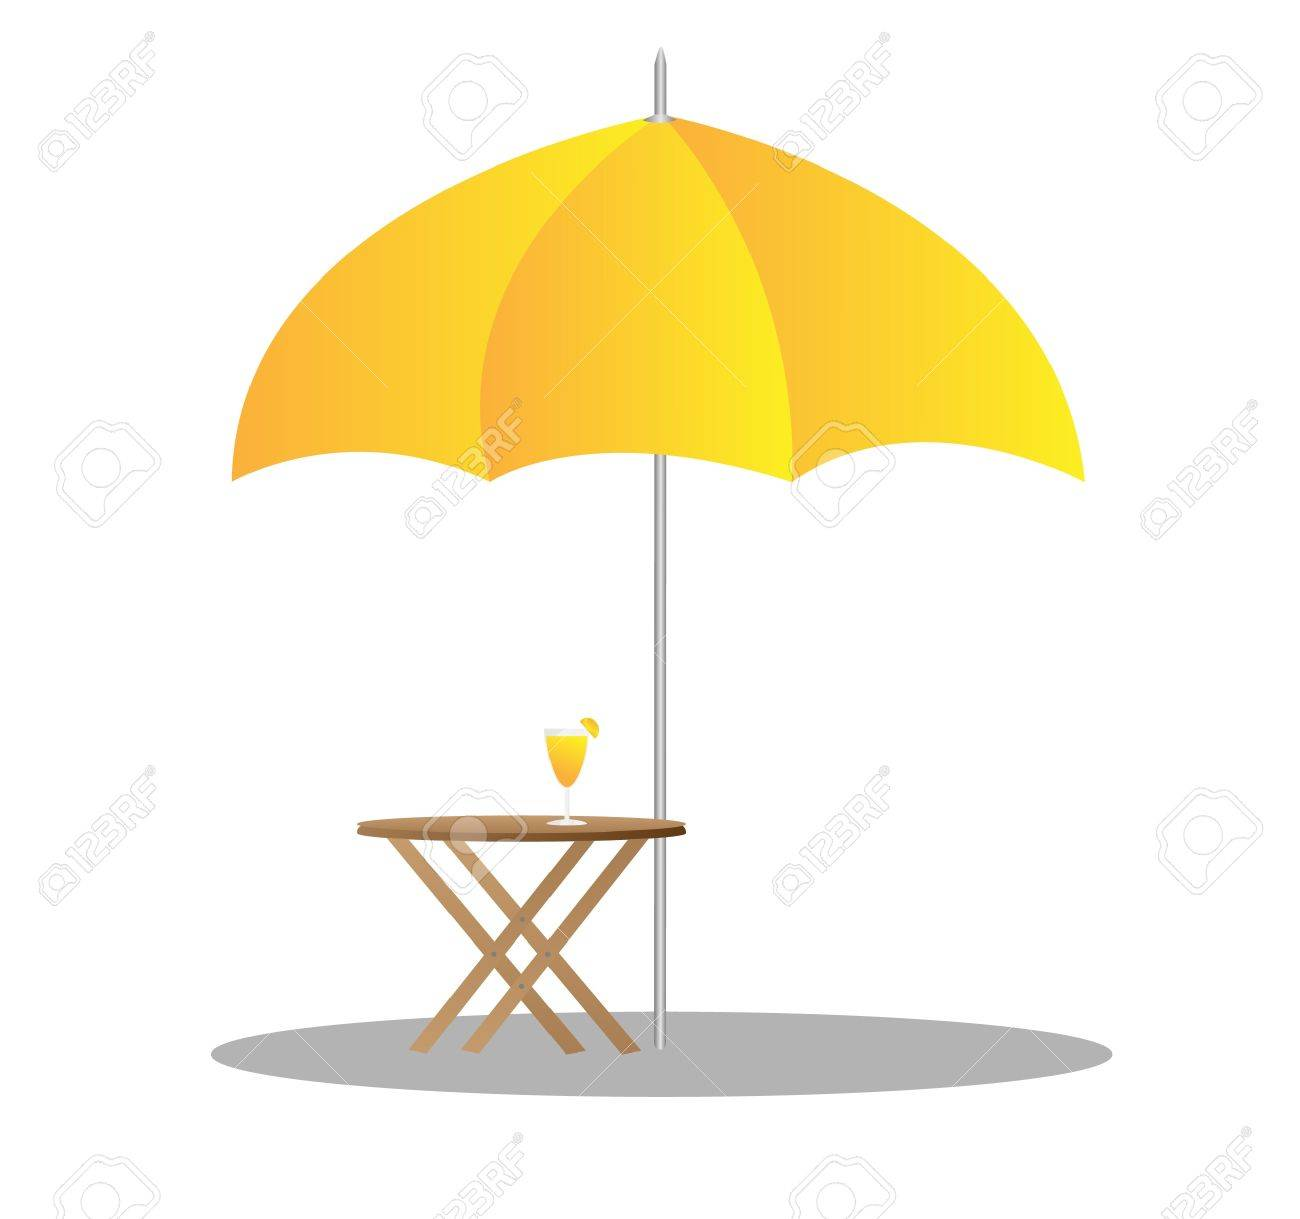 beach chairs under sunshade 3d illustration - 14830937